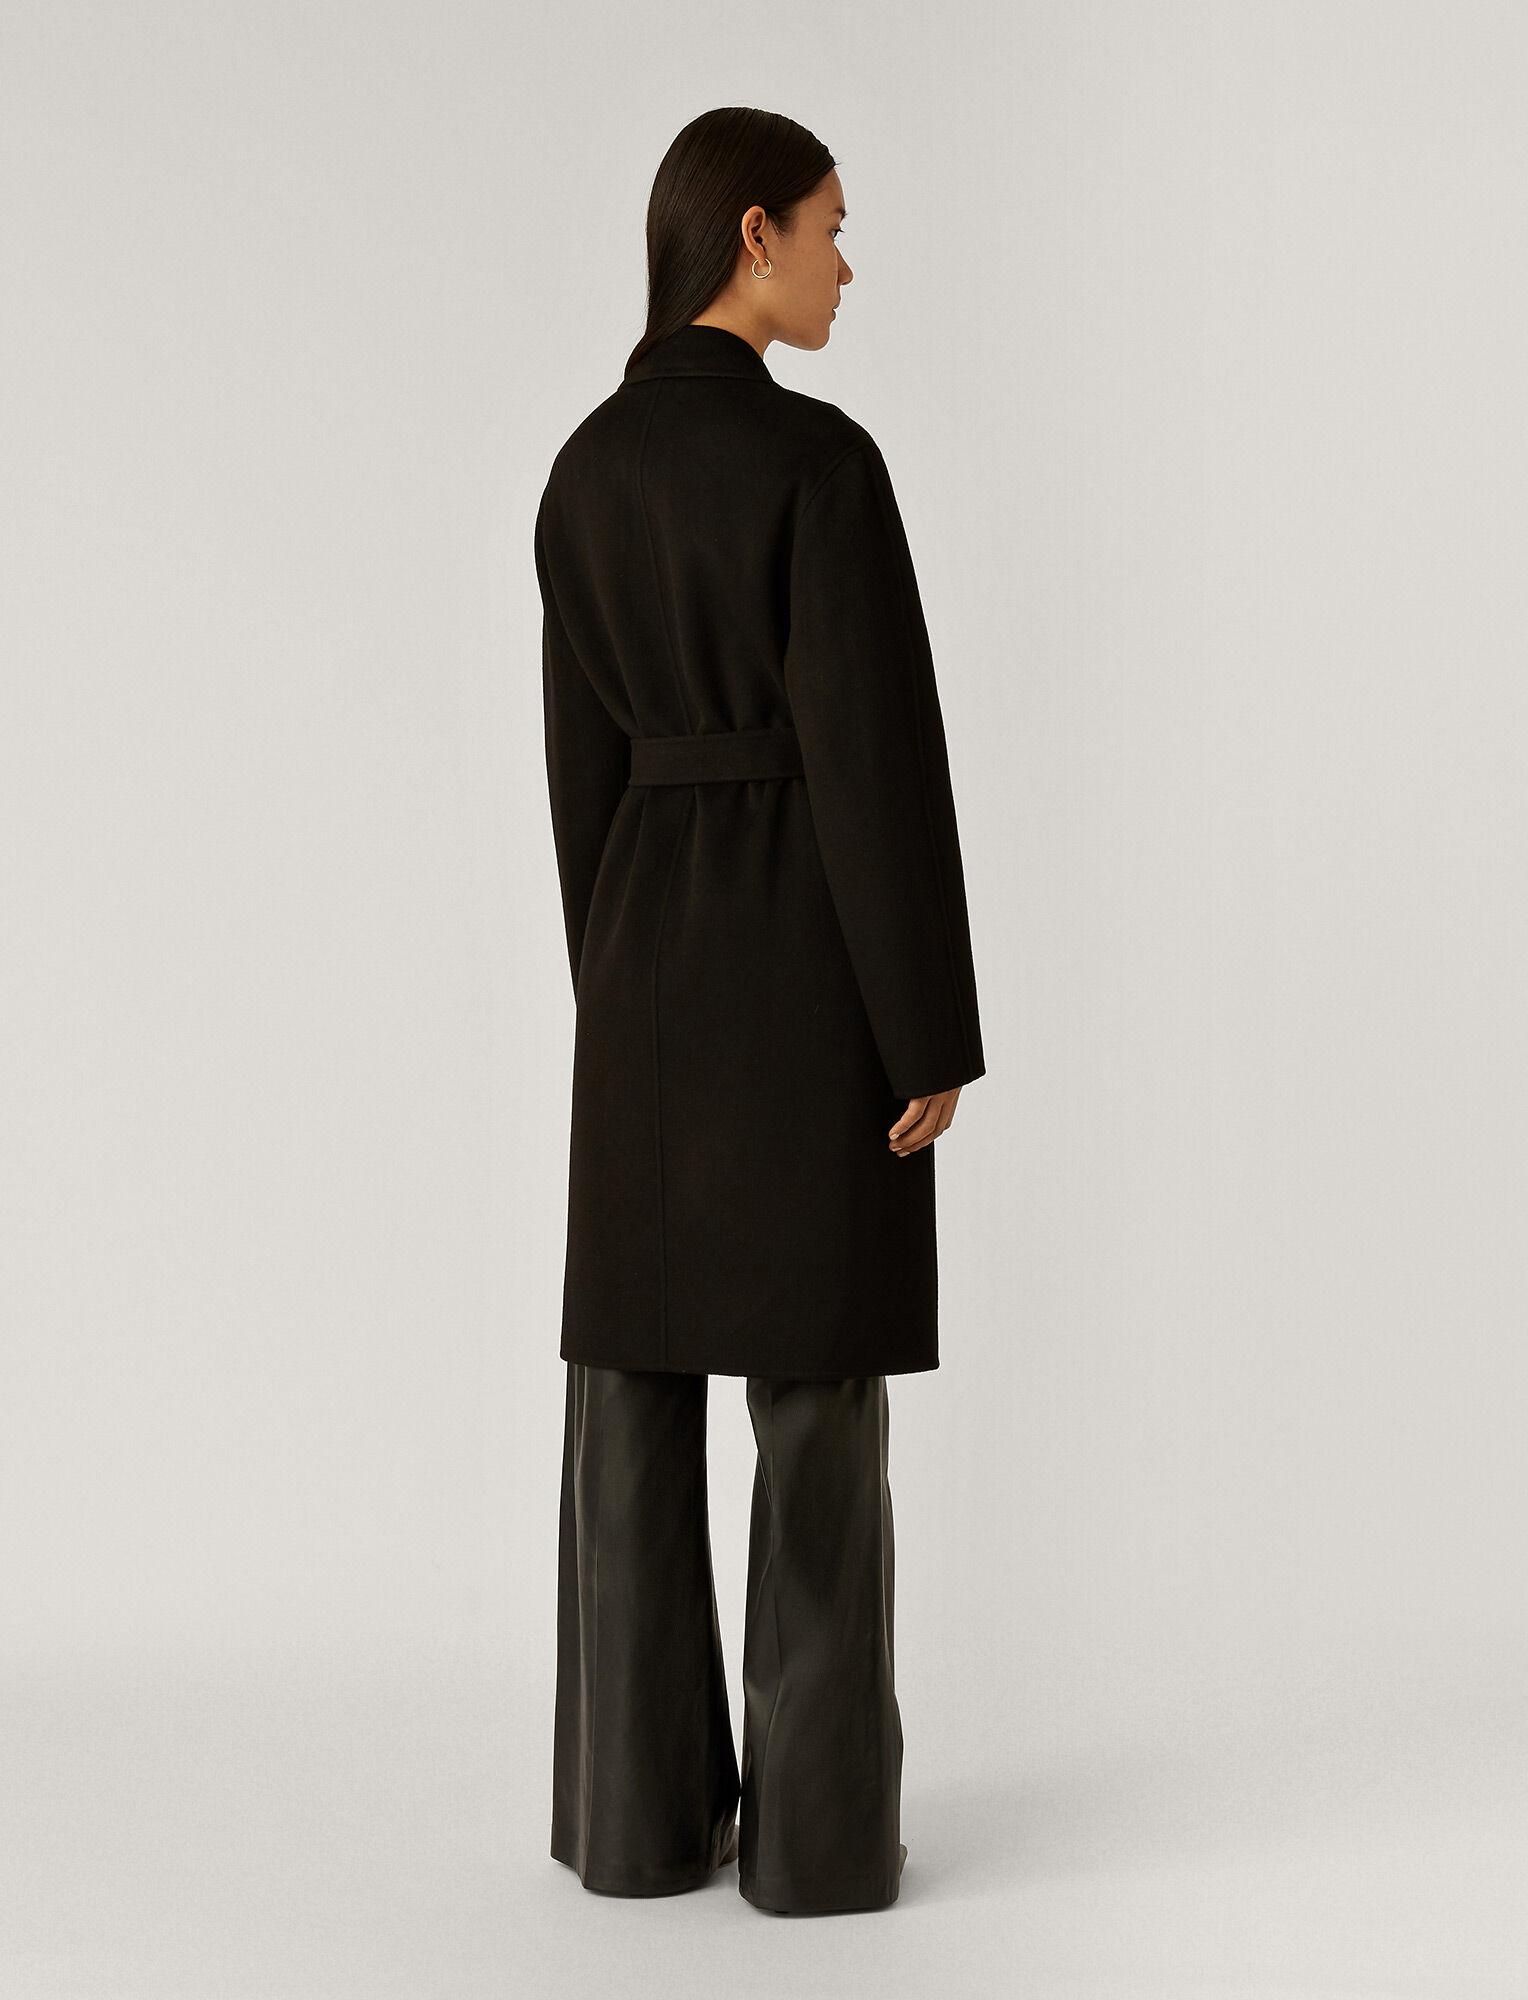 Joseph, Cenda Long Cashmere Coat, in Black